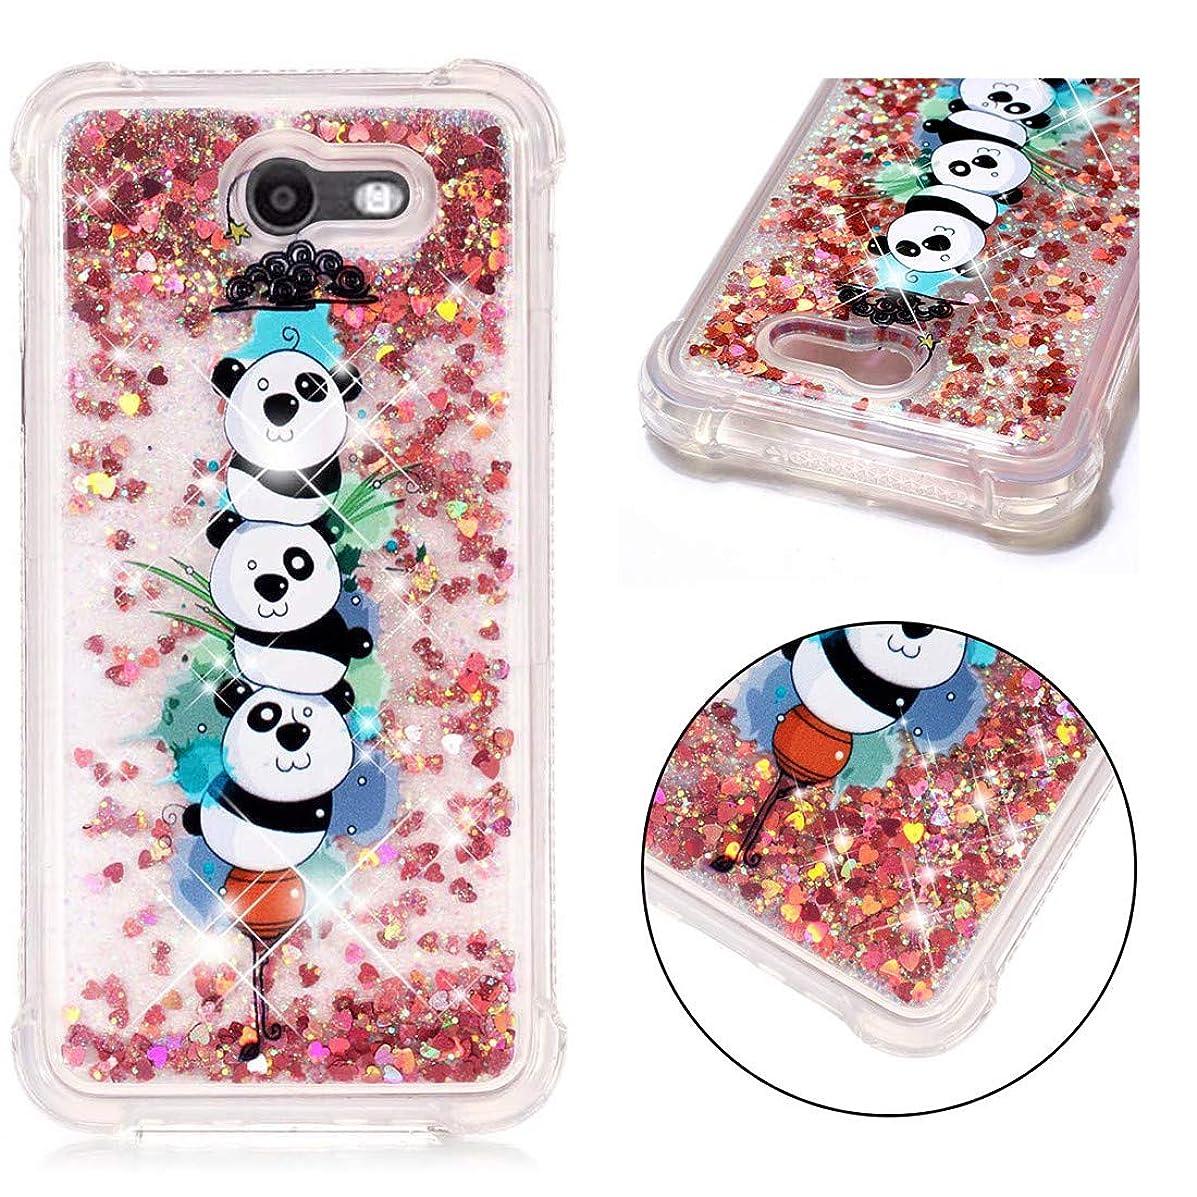 Galaxy J7 V / J7 Perx / J7 Sky Pro / J7 2017 Case, Lwaisy Flowing Liquid Floating Shock-Absorbing Flexible TPU Bumper Glitter Cover Phone Protective Case for Samsung Galaxy J7 2017 - Three Panda